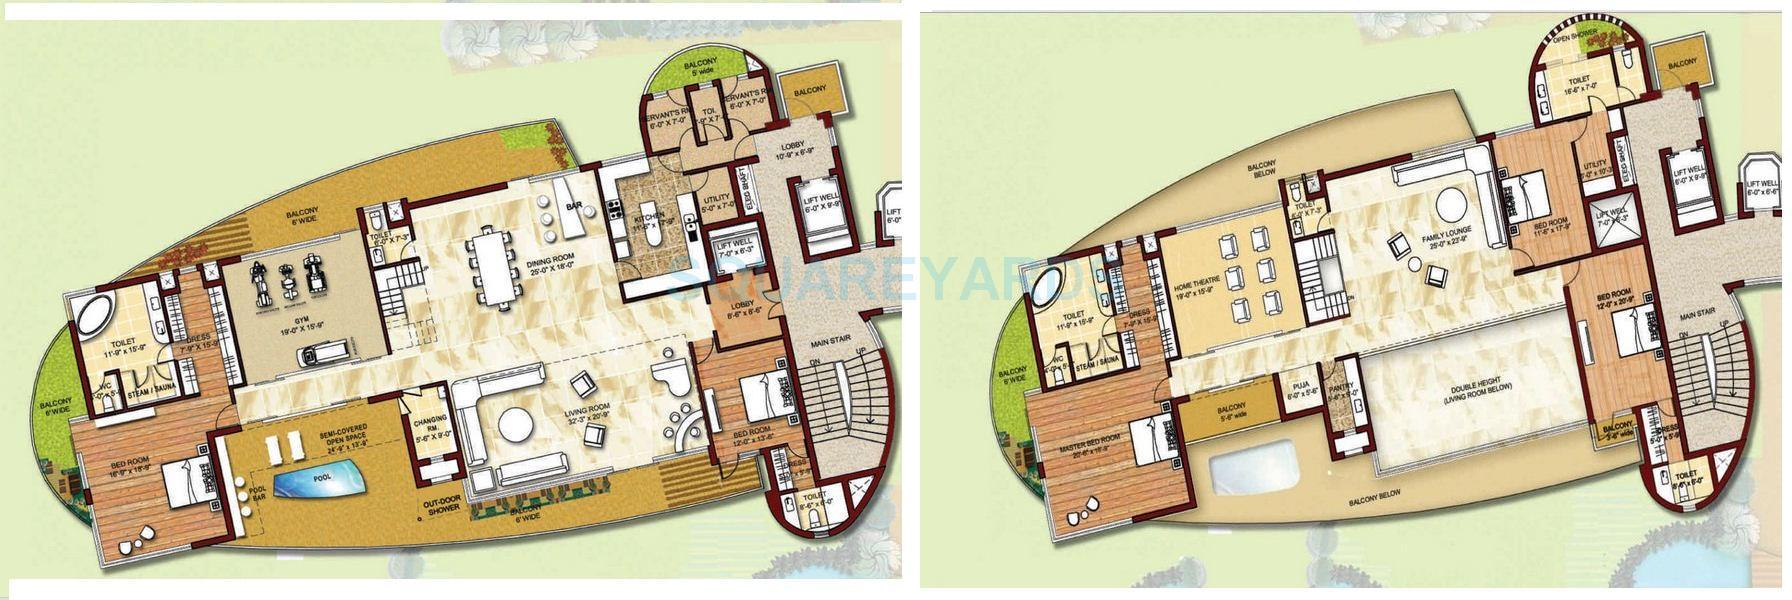 krrish provence estate penthouse 5bhk 10000sqft 1